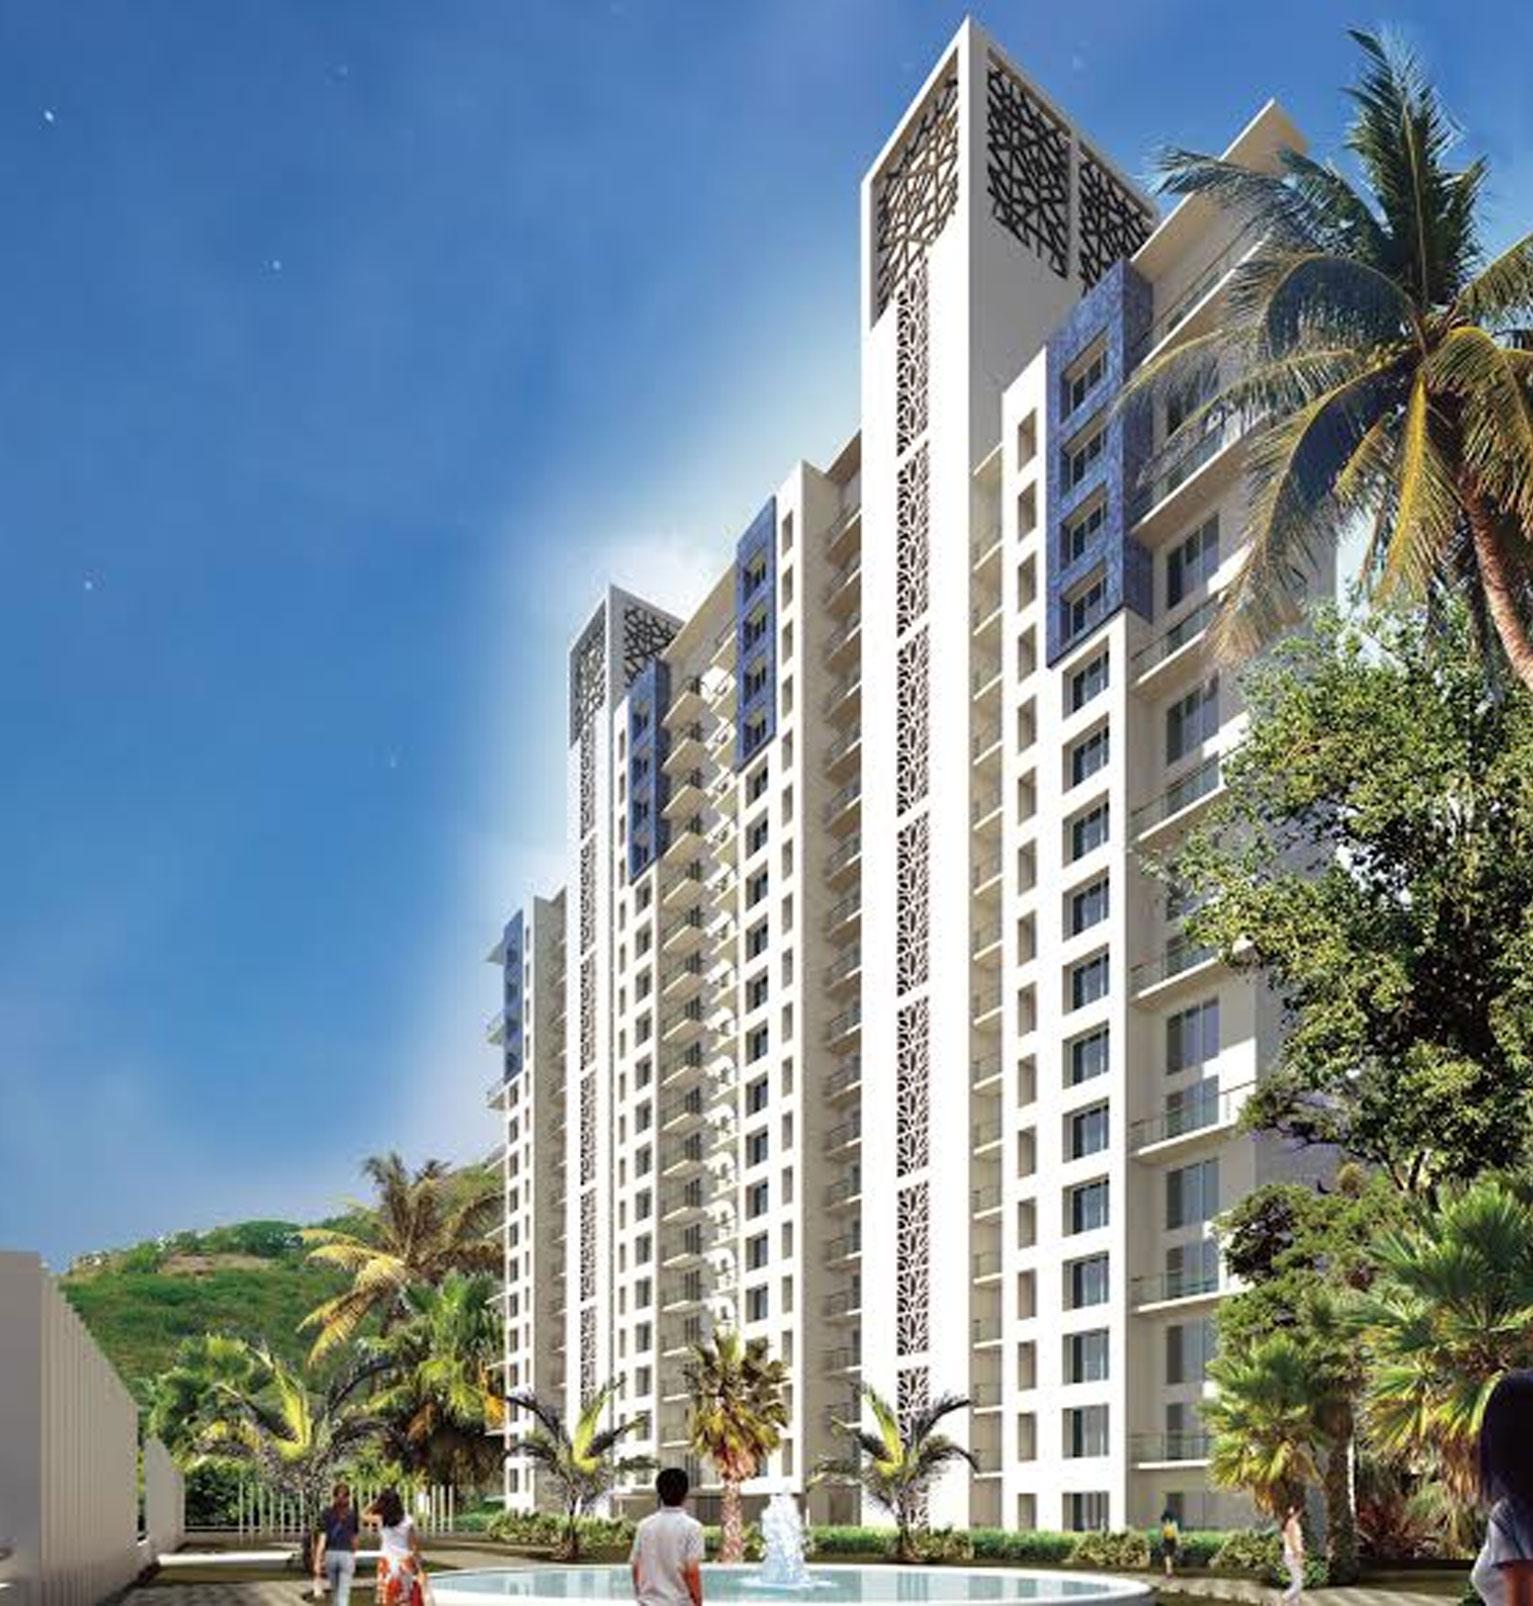 Residential Multistorey Apartment for Sale in Chandivali , Andheri-West, Mumbai